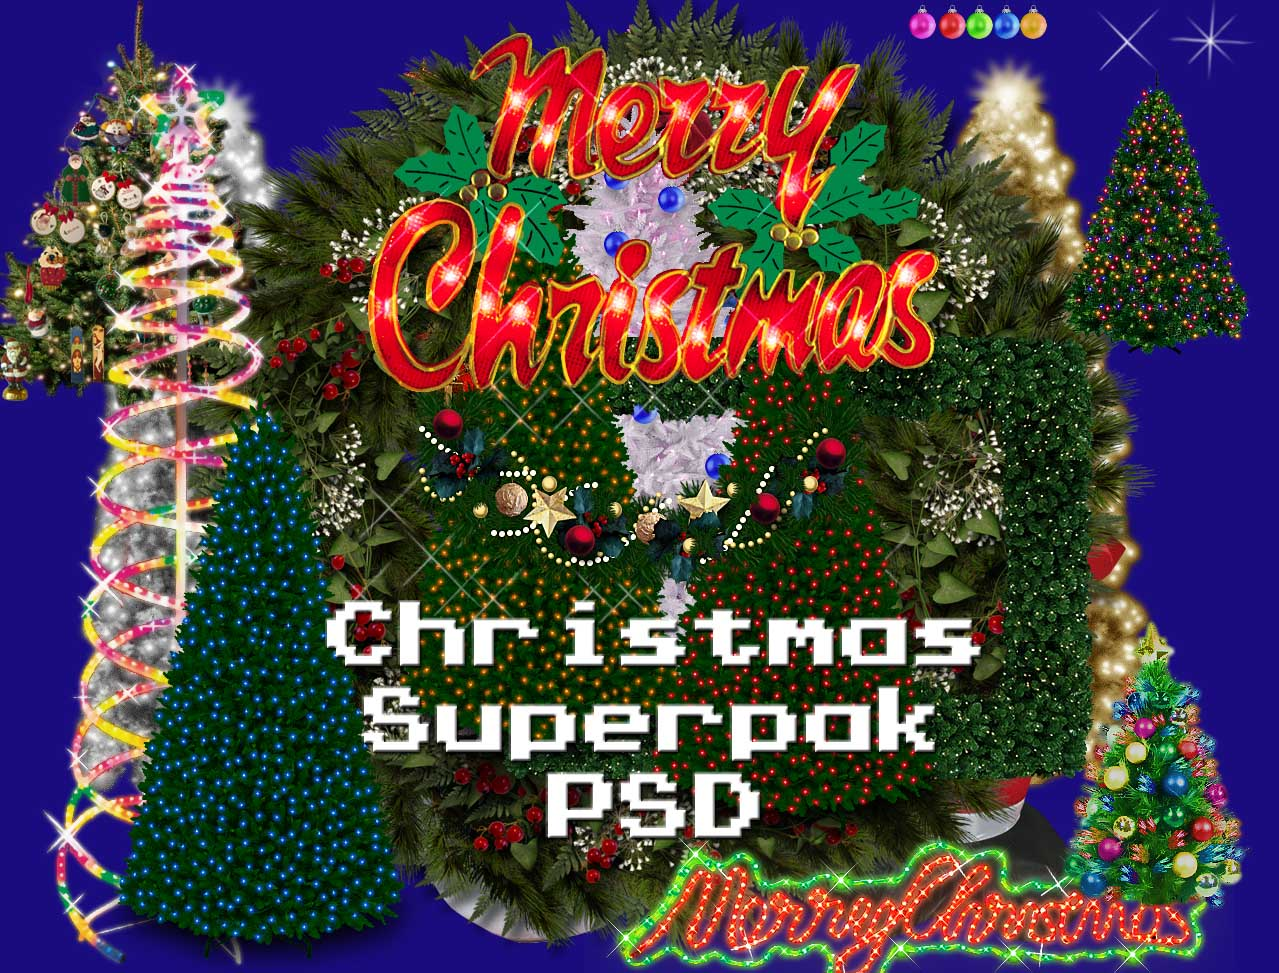 Christmas Megapak PSD by dbszabo1